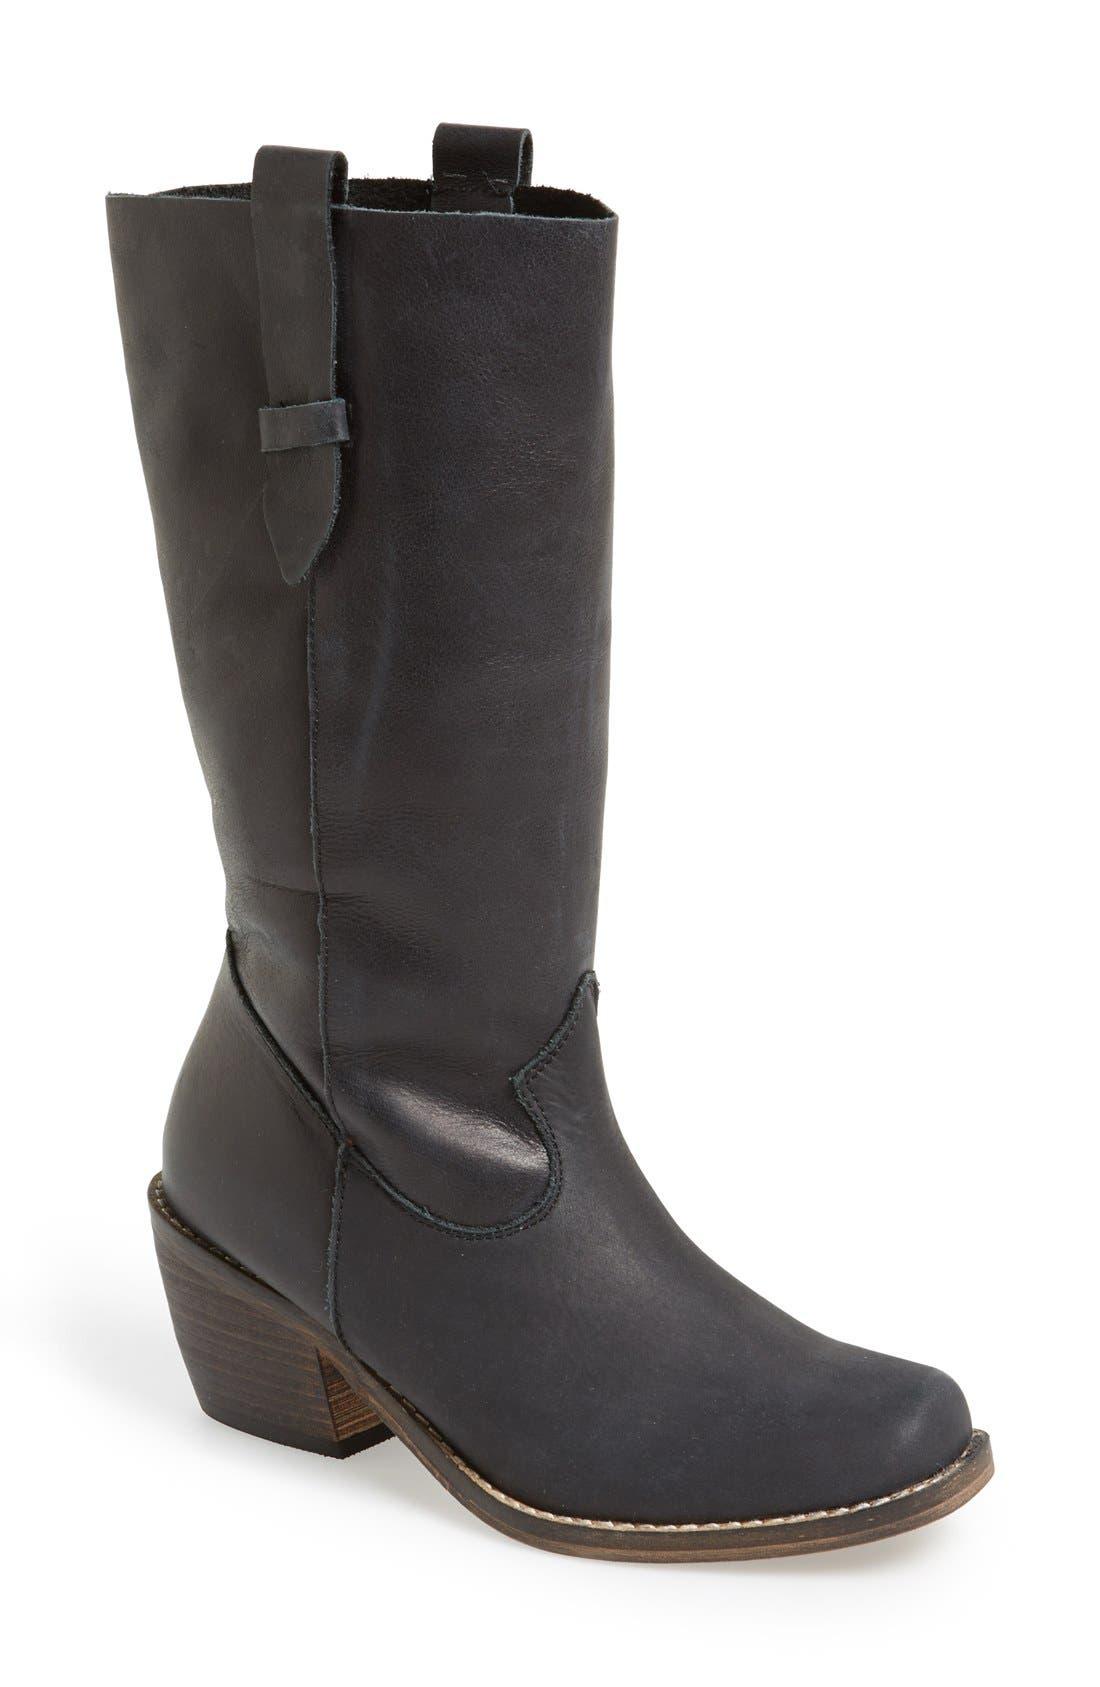 Alternate Image 1 Selected - MTNG Originals 'Fiona' Western Boot (Women)